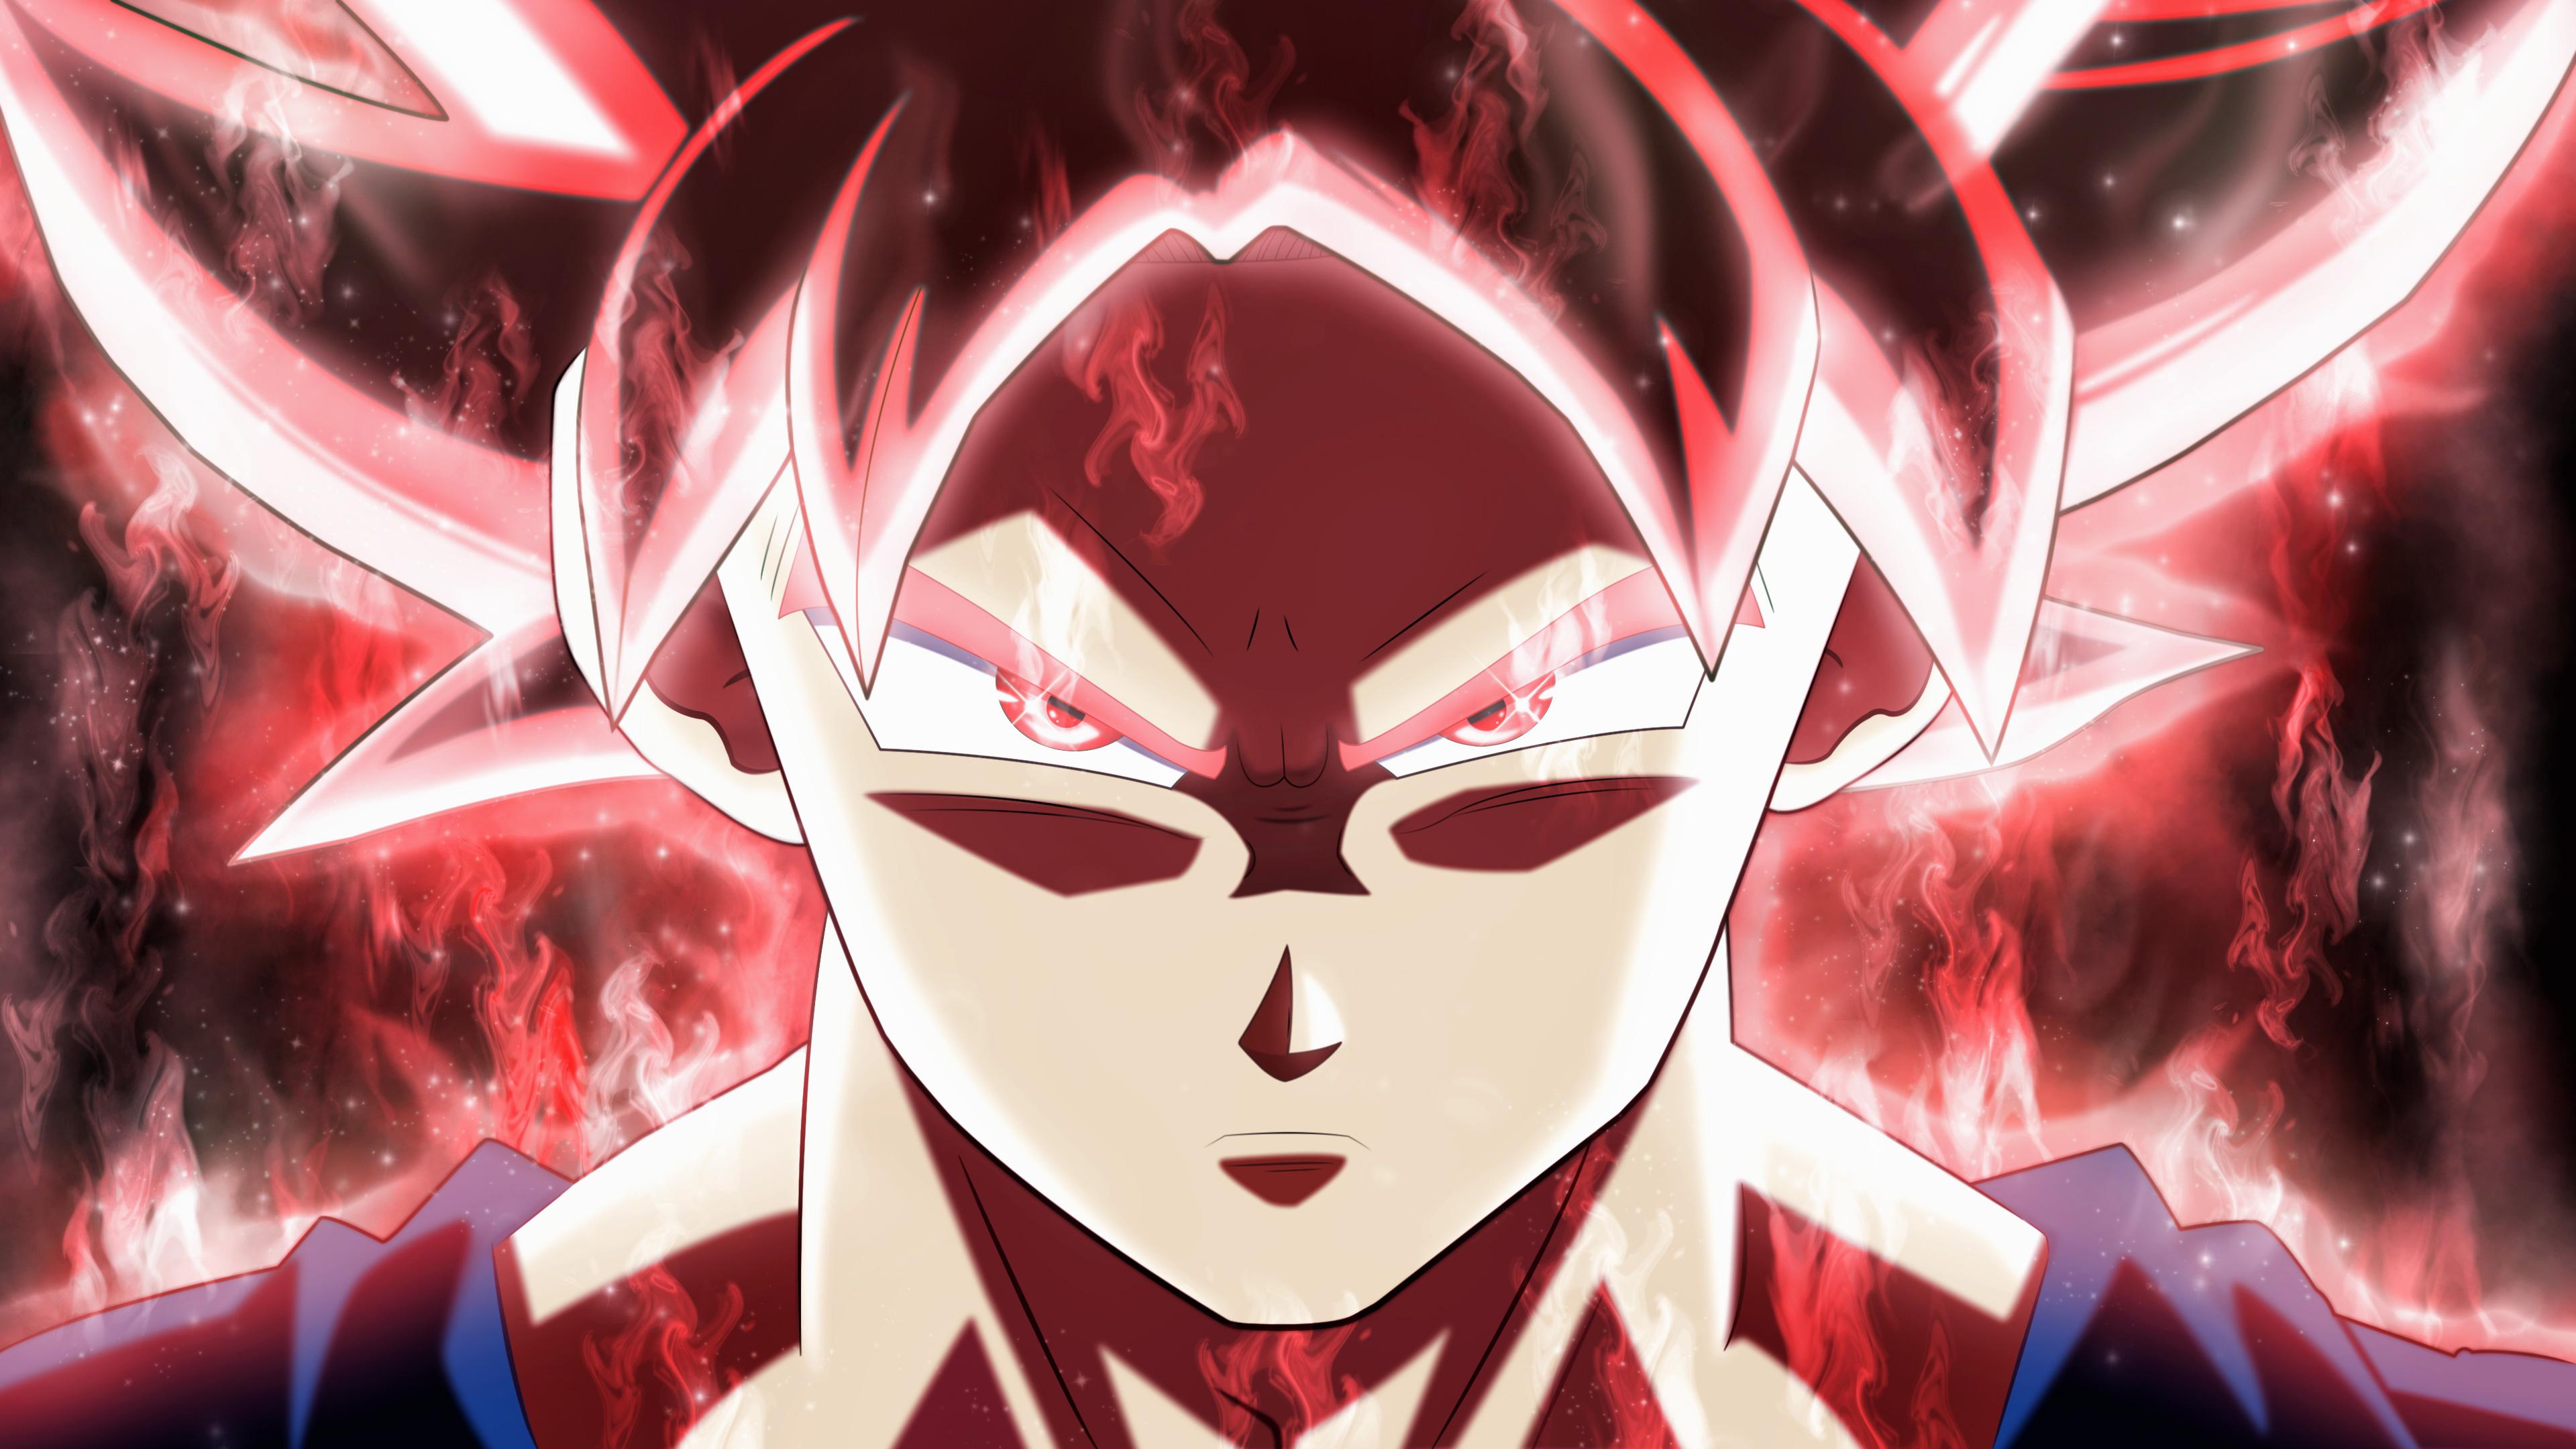 Goku 3d Wallpaper Download Son Goku In Dragon Ball Super 4k Wallpapers Hd